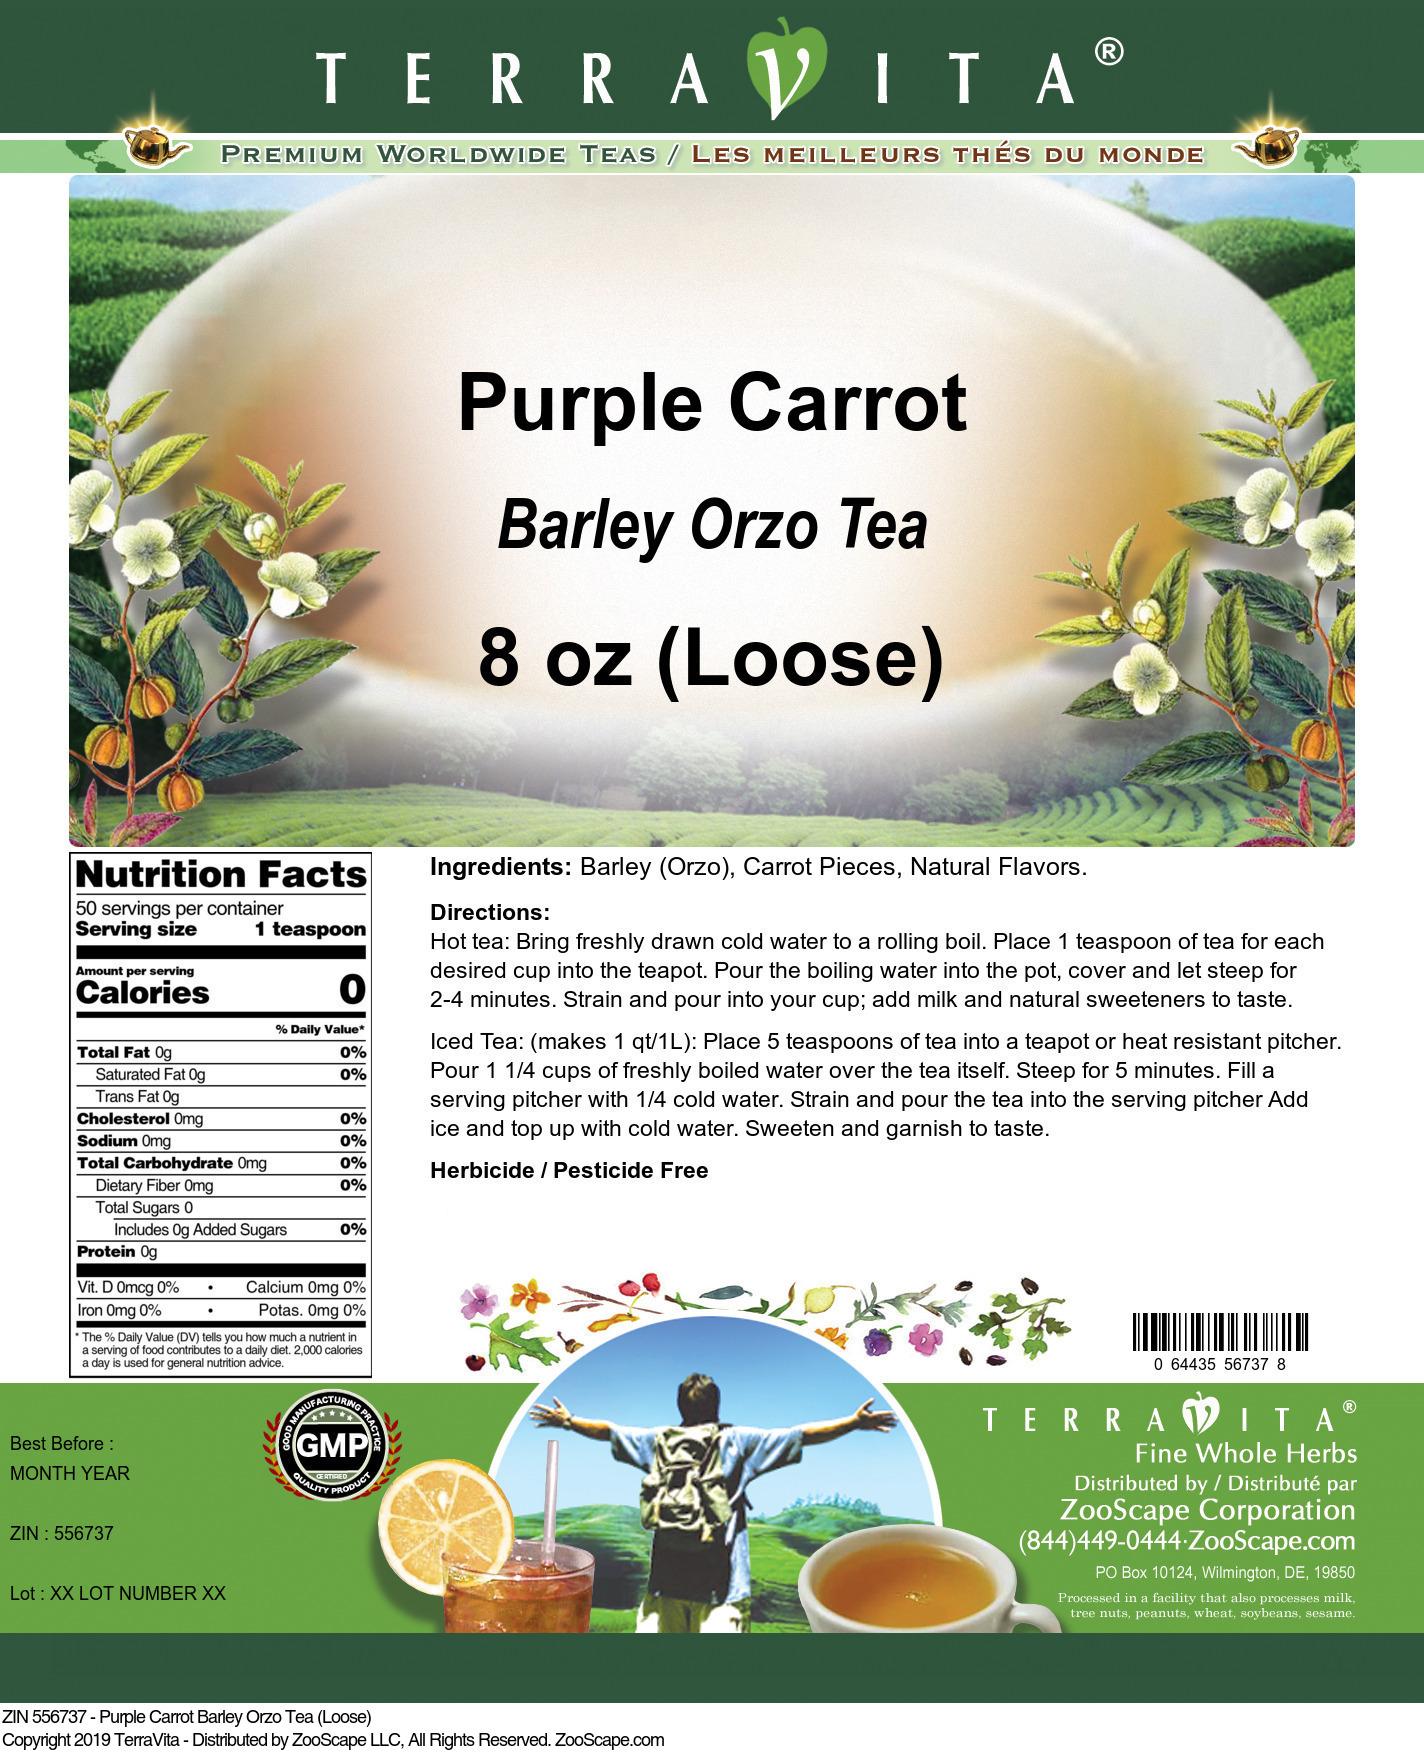 Purple Carrot Barley Orzo